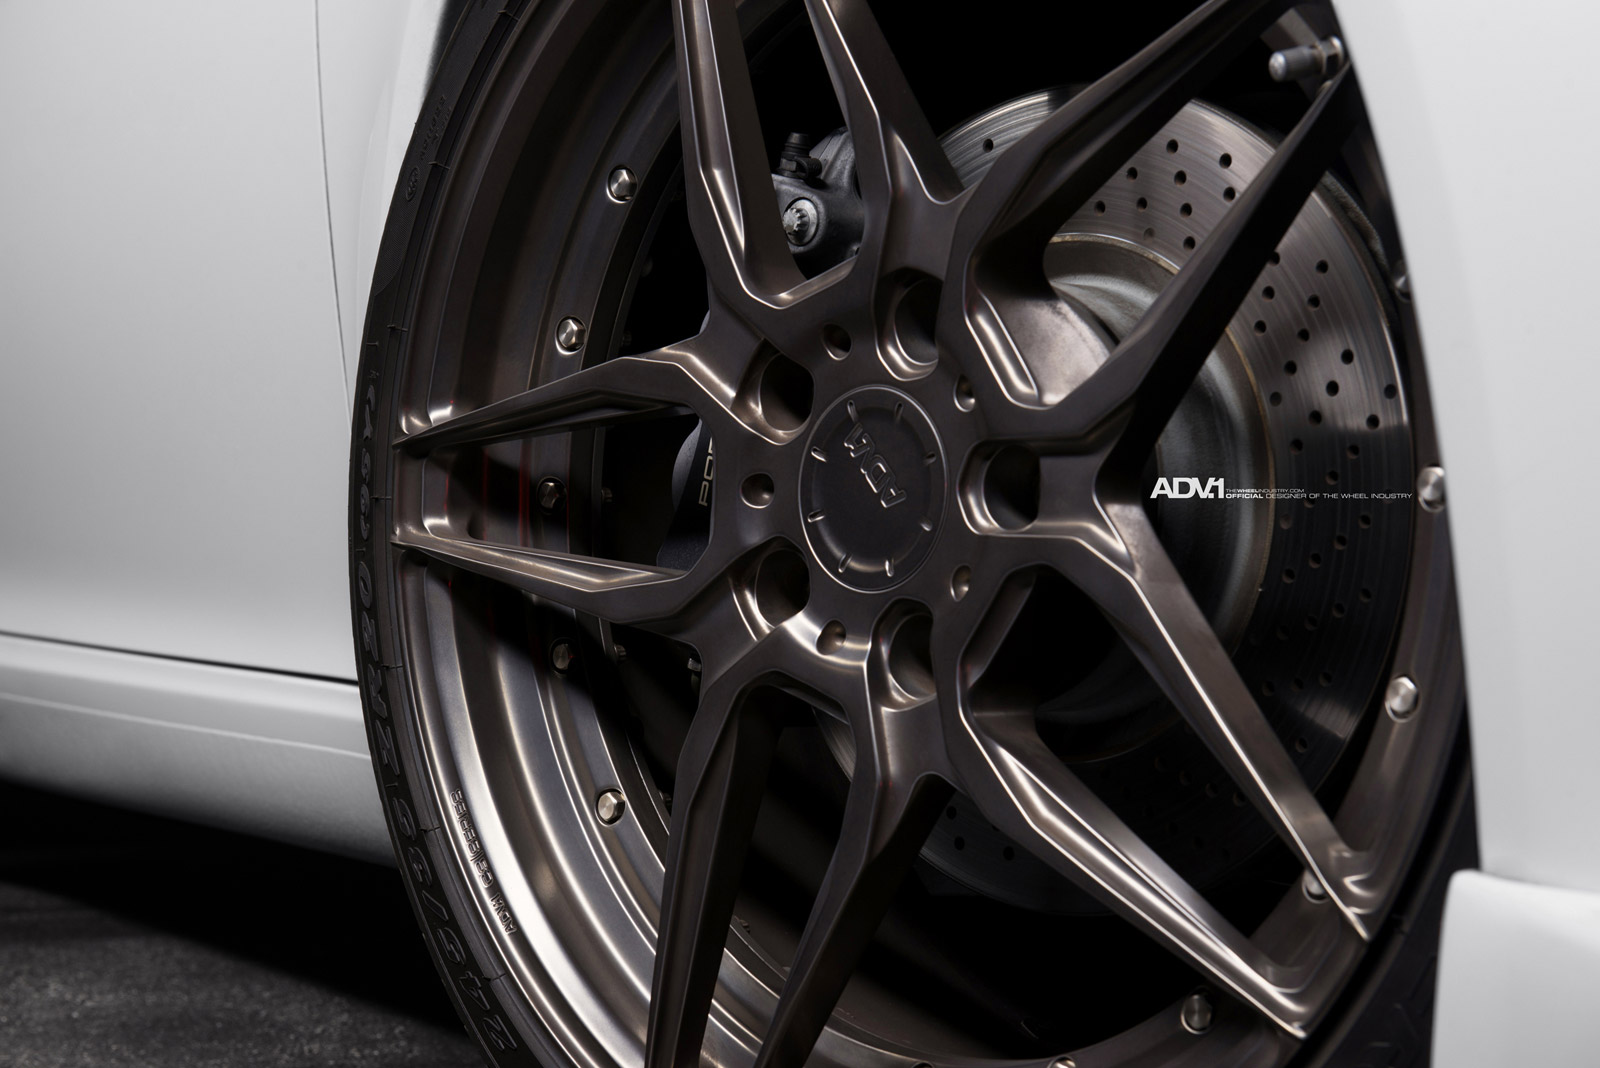 ADV1-Wheels-Porsche-991-Carrera-ADV05SMV2CS-6